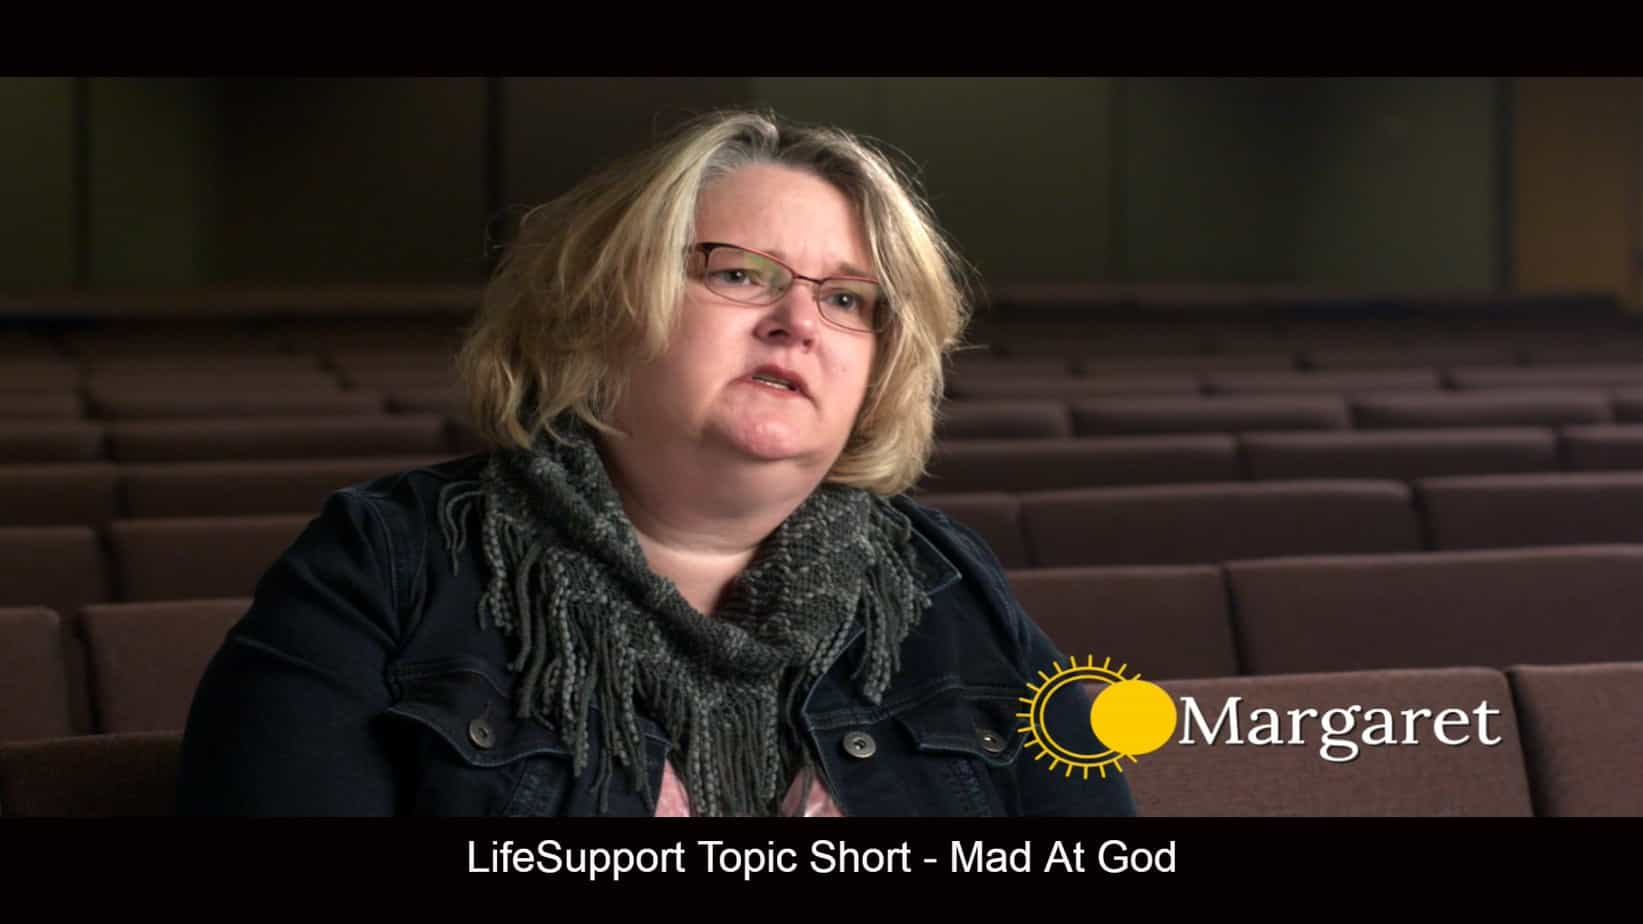 Mad at God depression